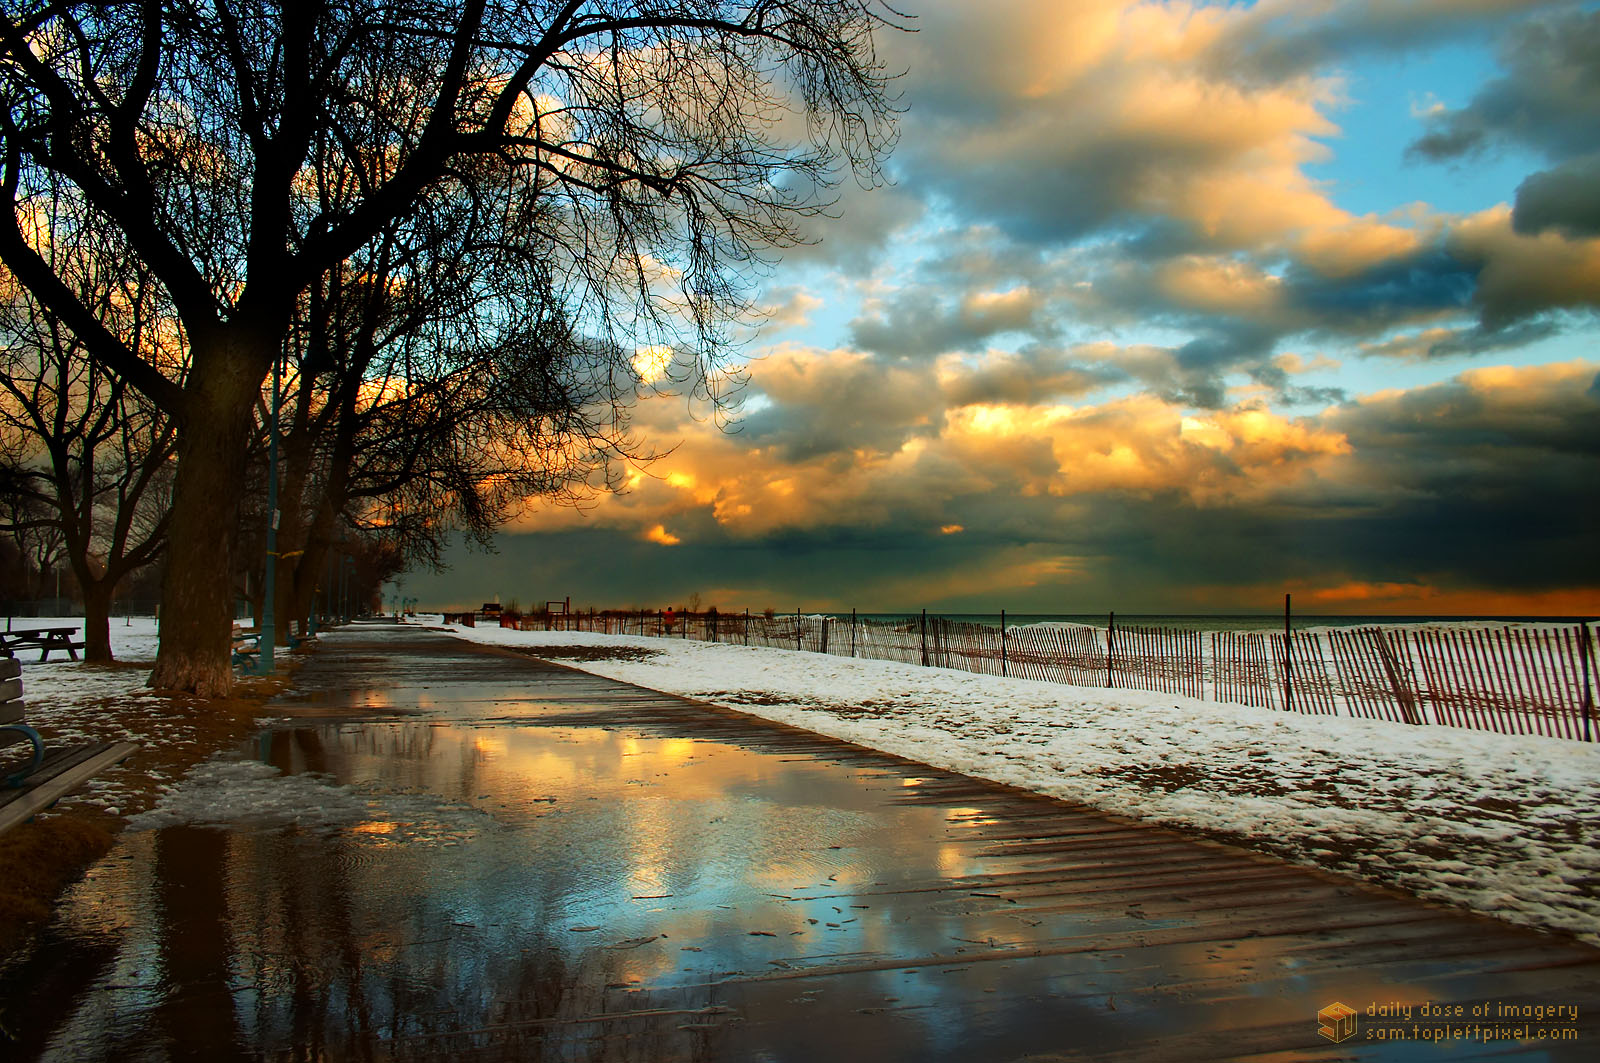 beaches_winter_sidewalk_reflection_wp.jpg